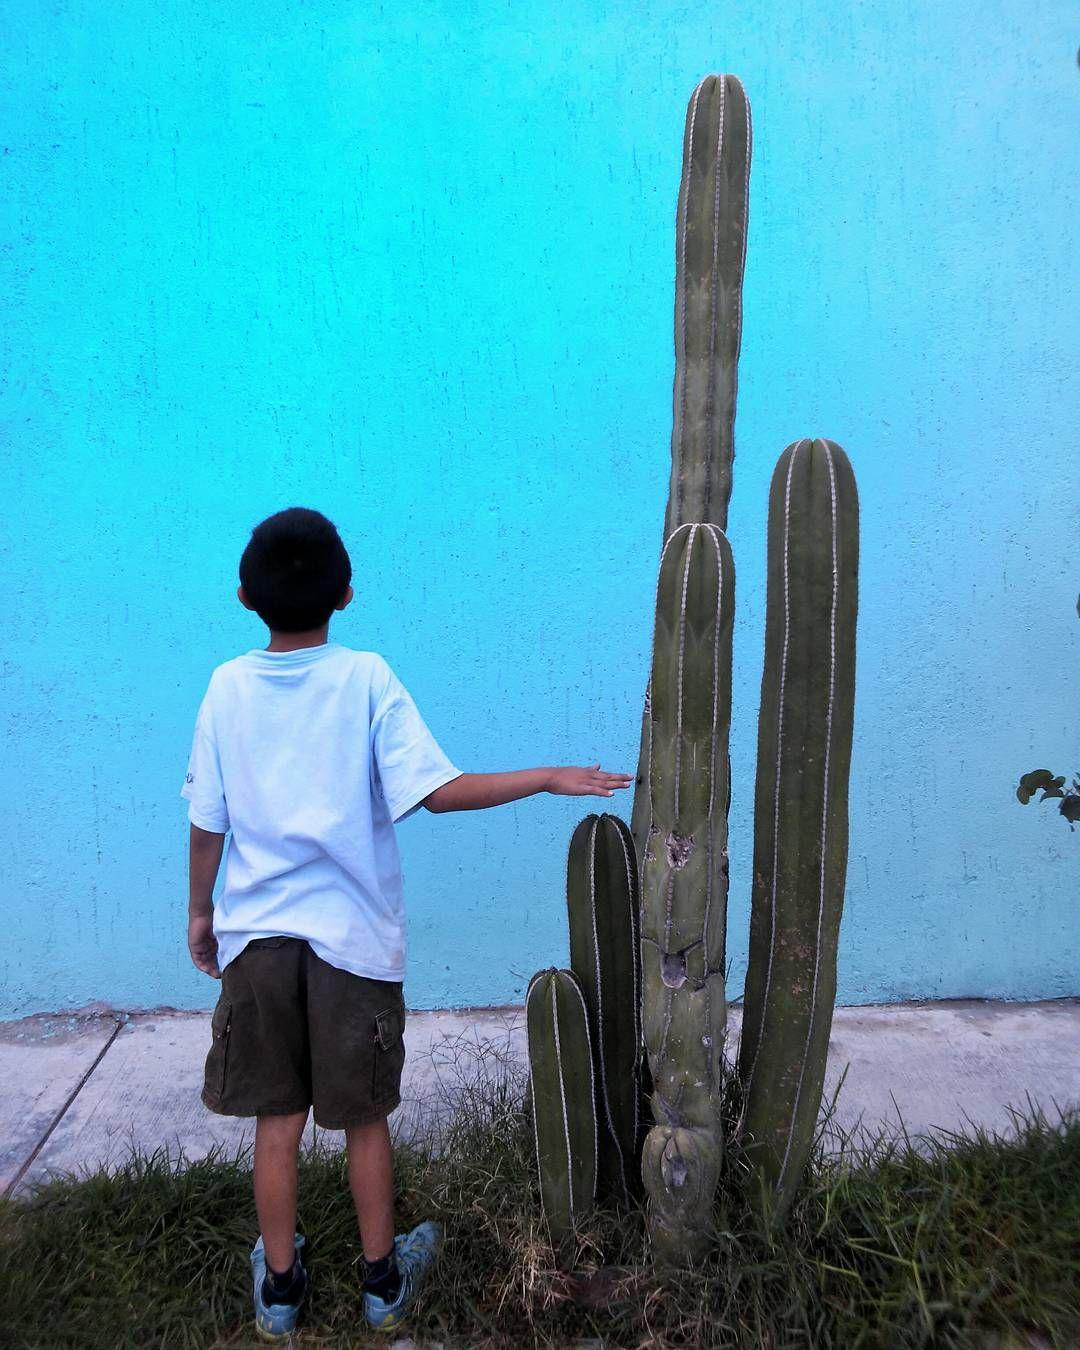 "adrian22lara: """"PEQUEÑO"" #igers #mexigers #contraste"""